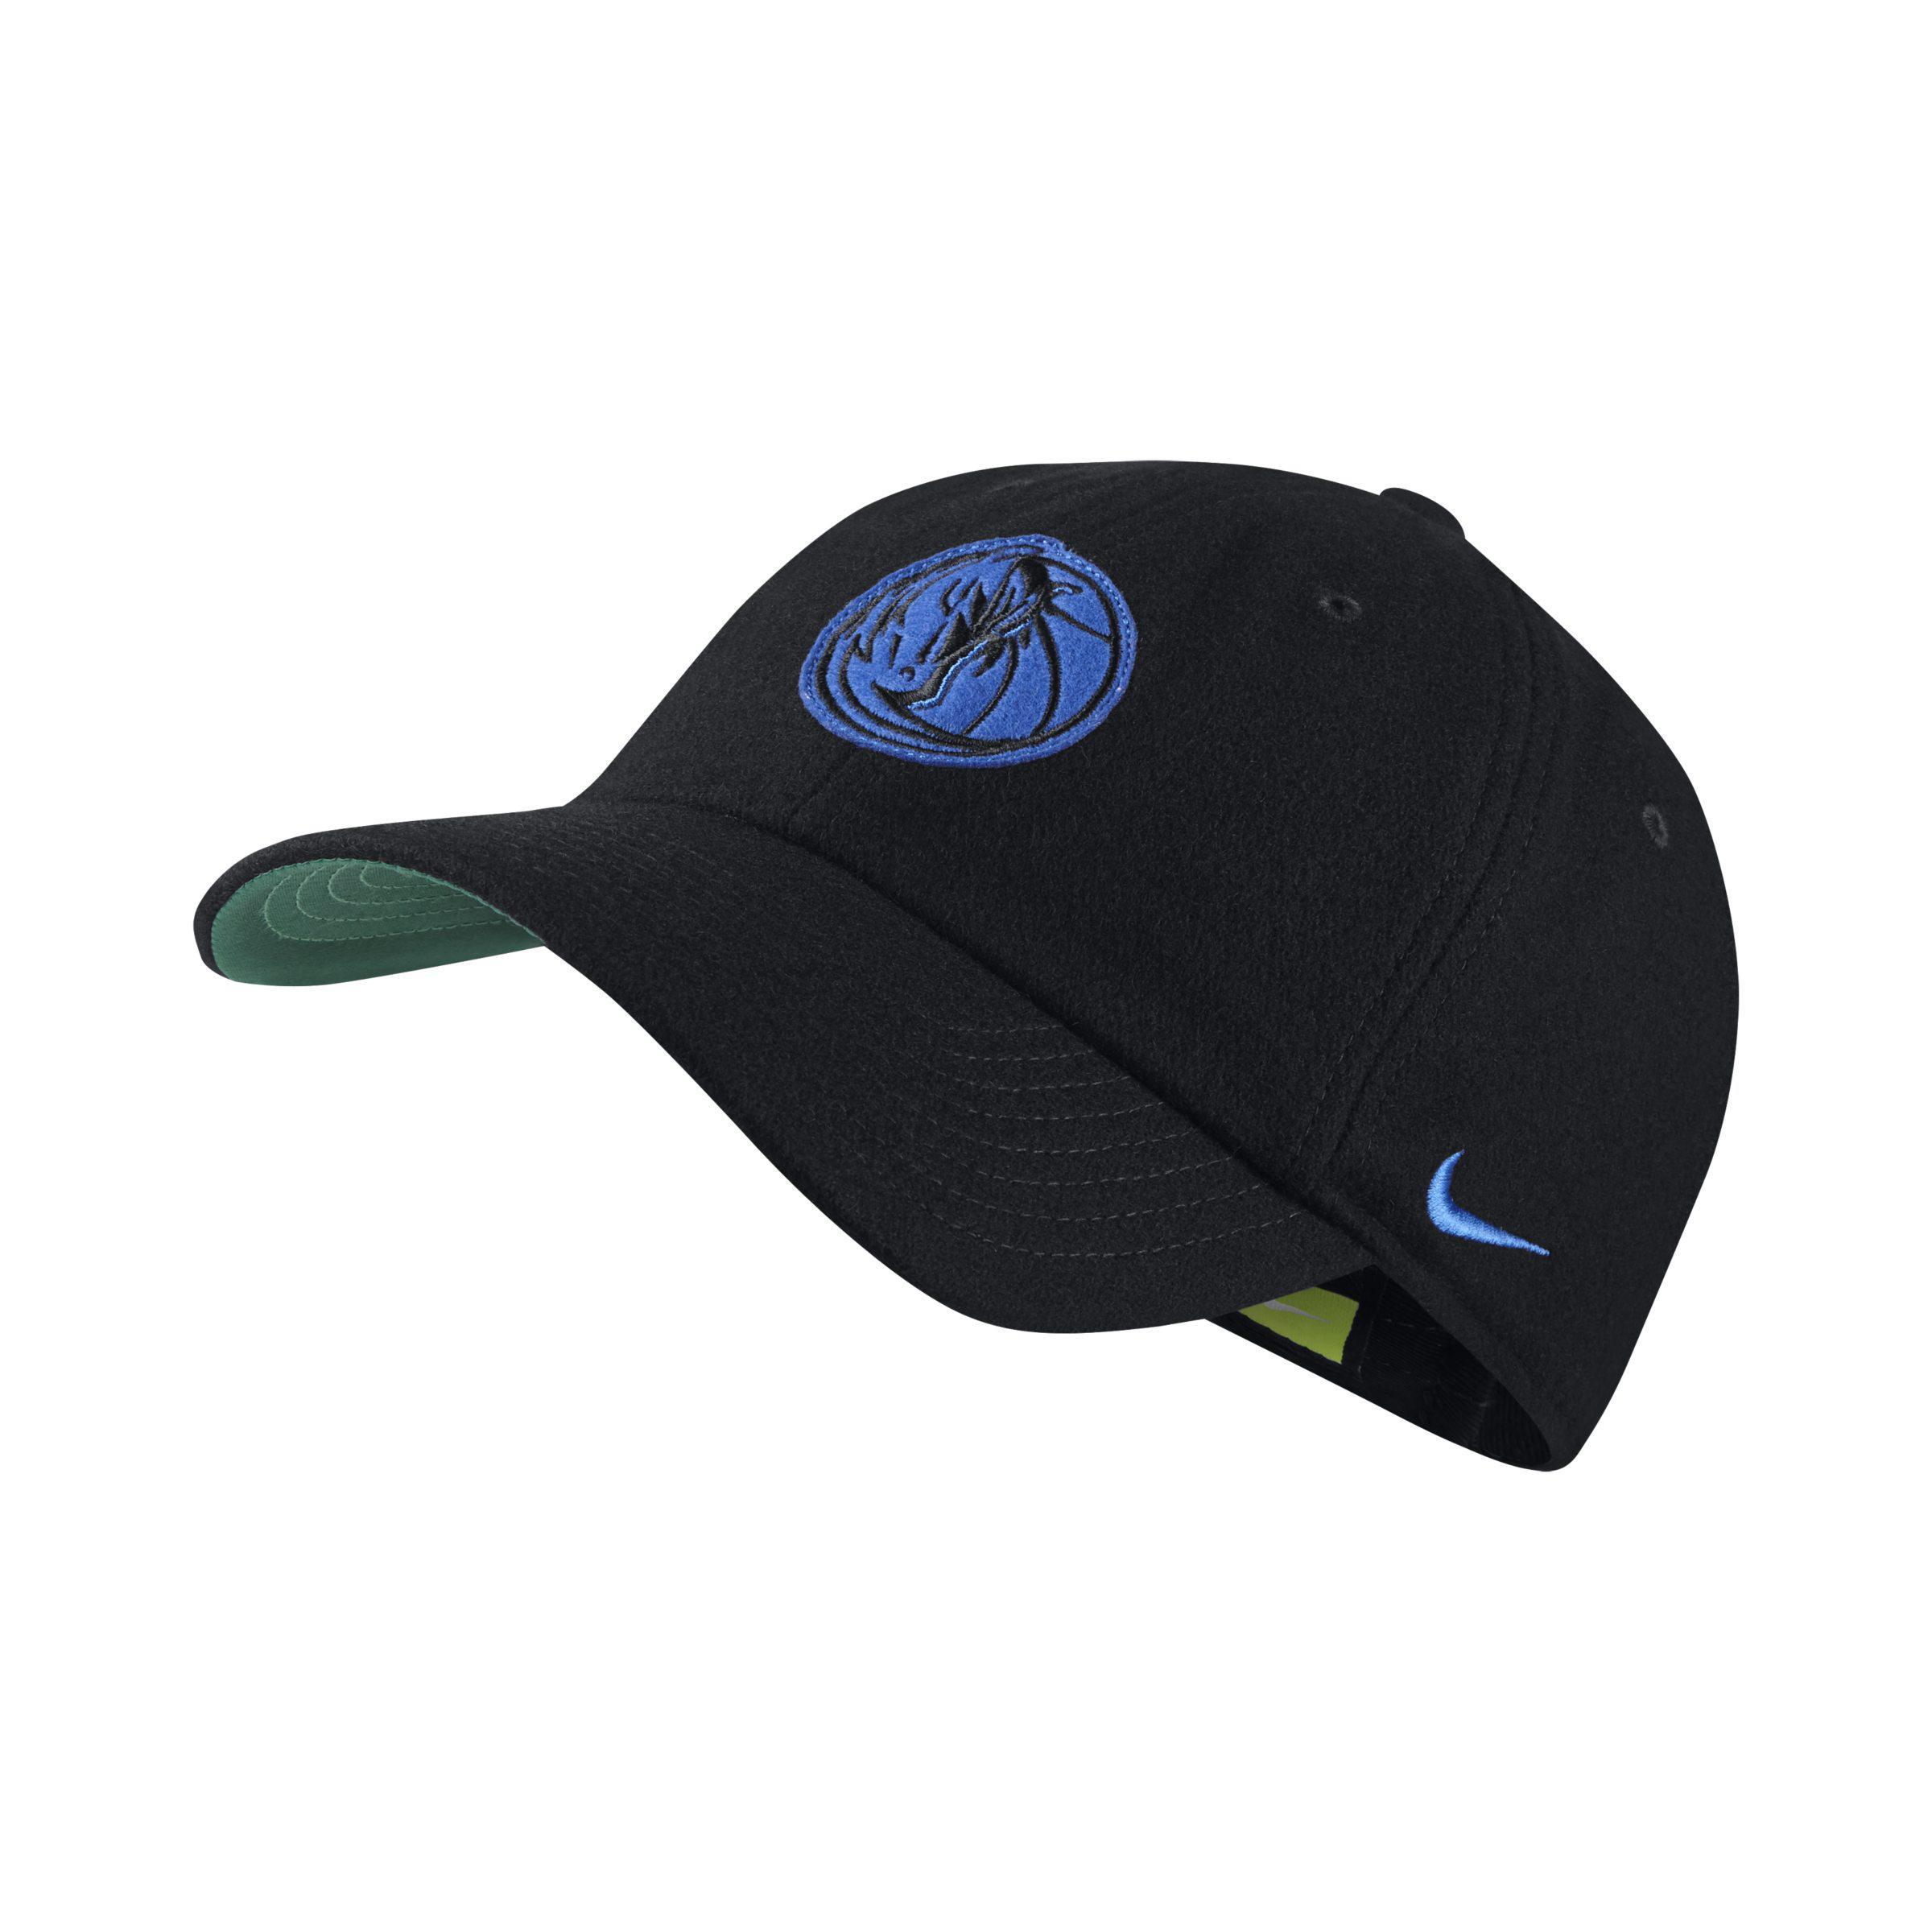 low priced cb492 e7c1f ... order nike black dallas mavericks heritage86 unisex nba hat lyst. view  fullscreen 93114 54a18